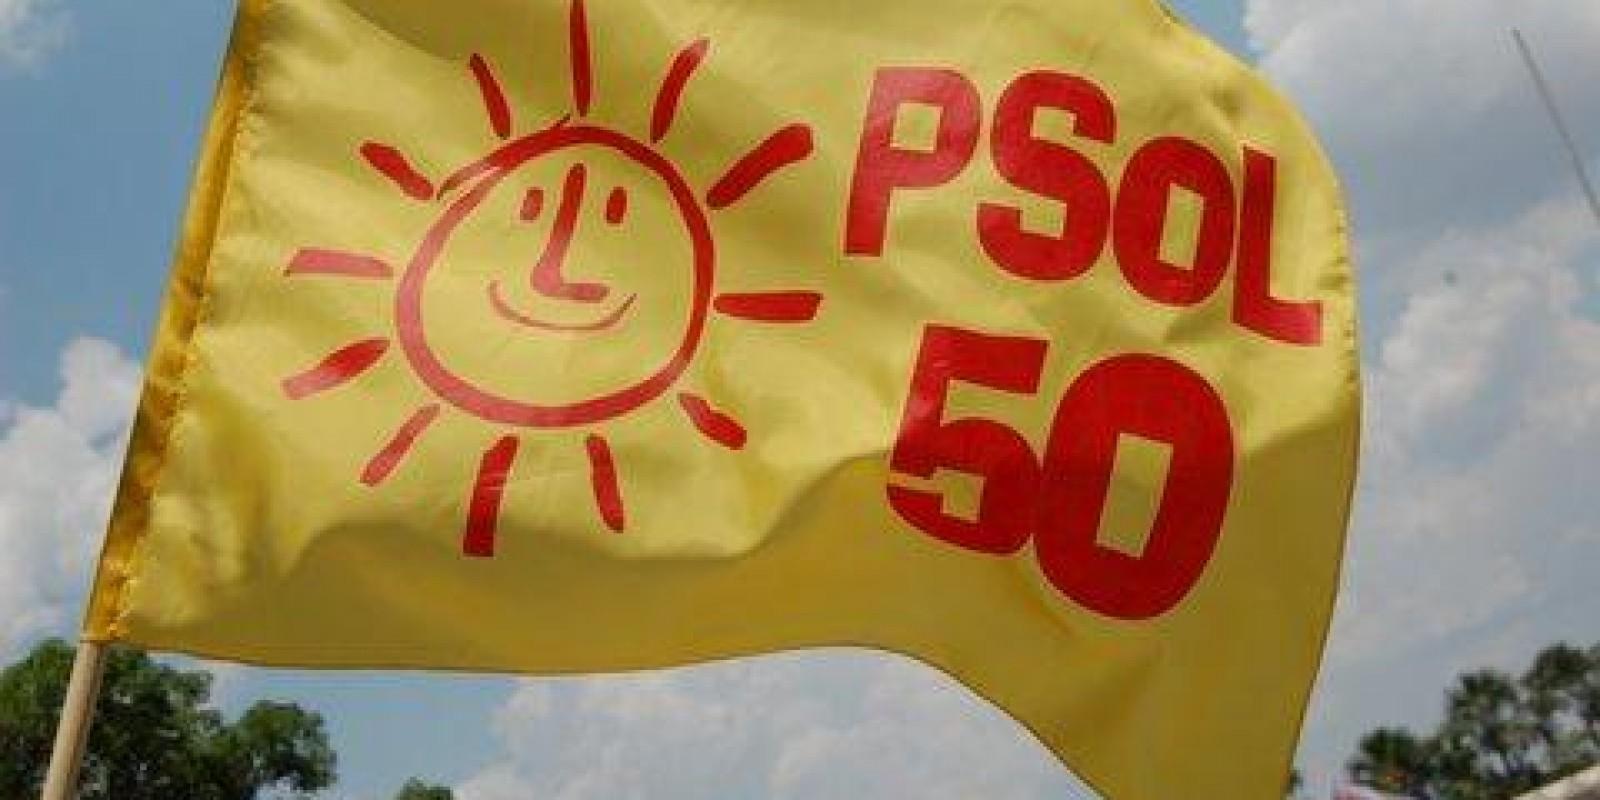 [Fortalecer o PSOL para derrotar o Bolsonarismo,  o ultraliberalismo e superar o capitalismo]